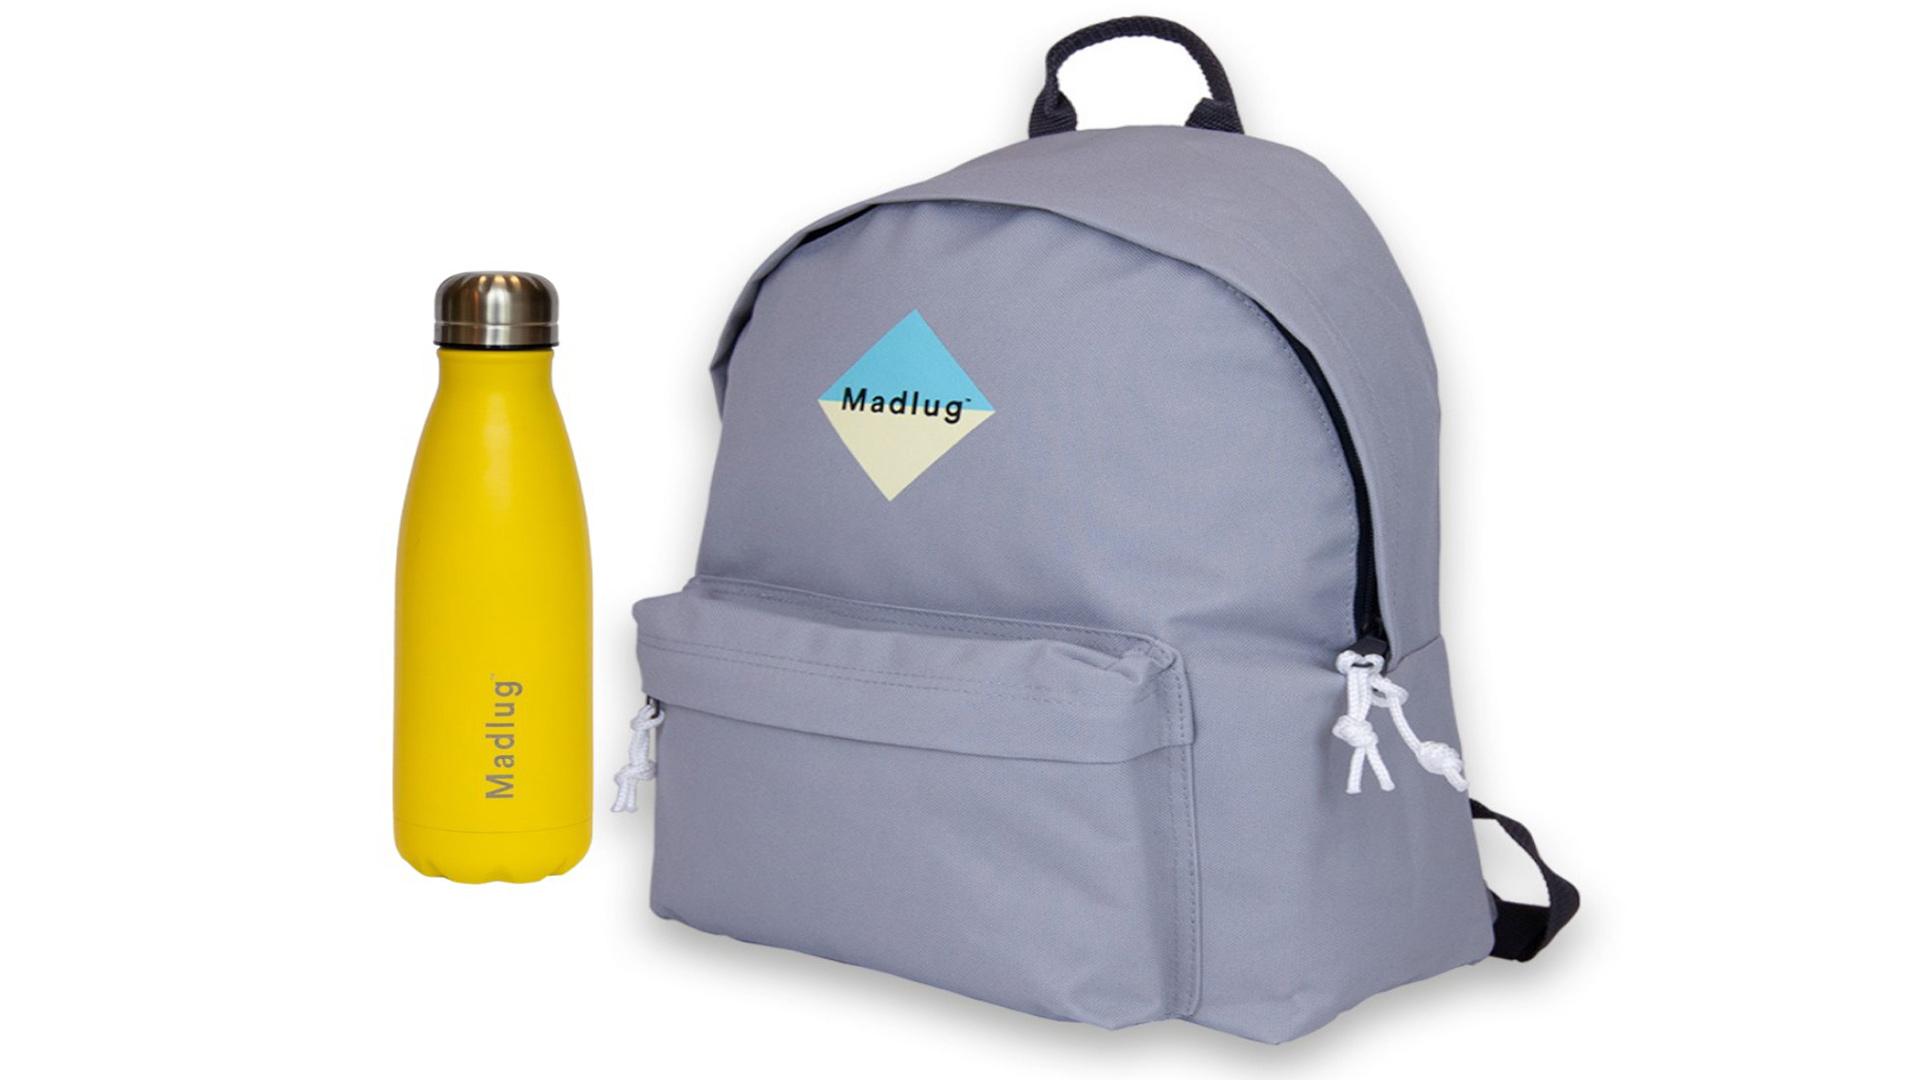 Win one of five Madlug™ Backpack & Water Bottle Bundles, Worth £50 each!